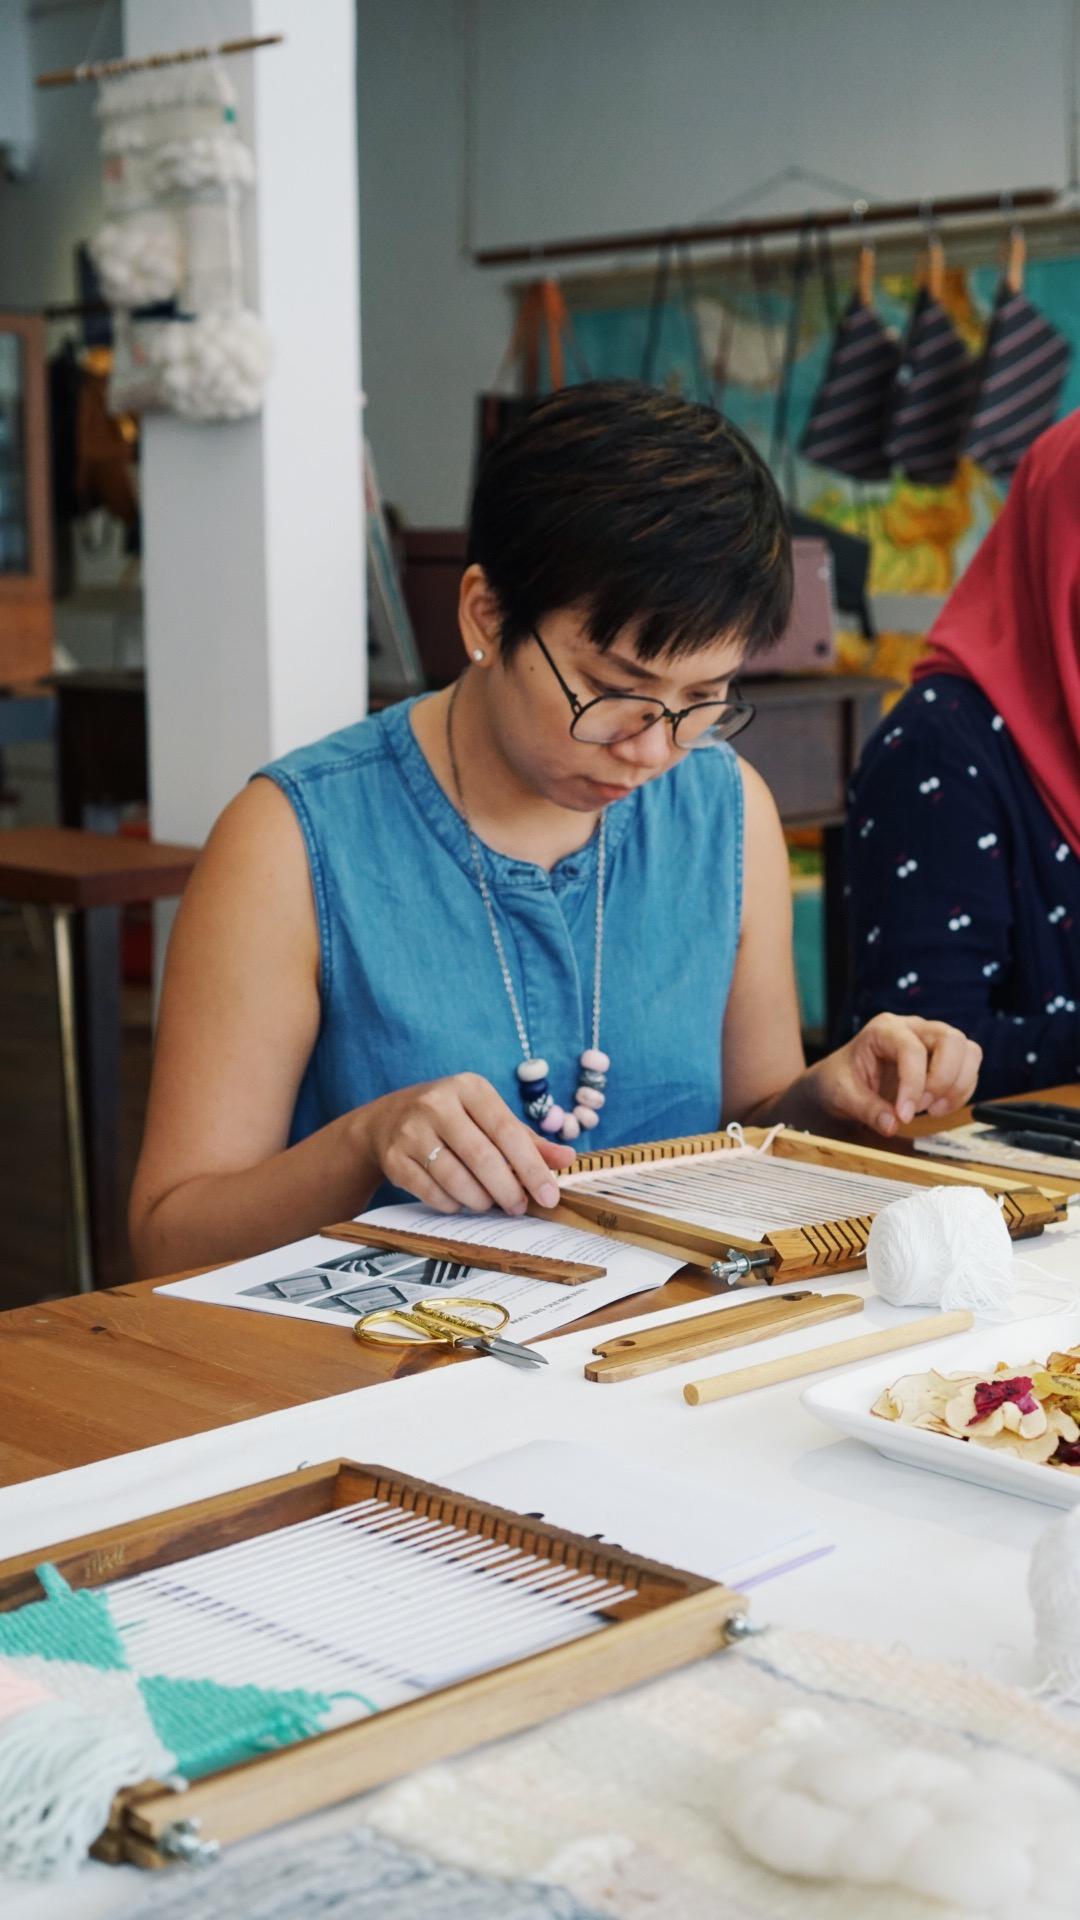 event-weaving-session-snackfood-kuala-lumpur-living-loving